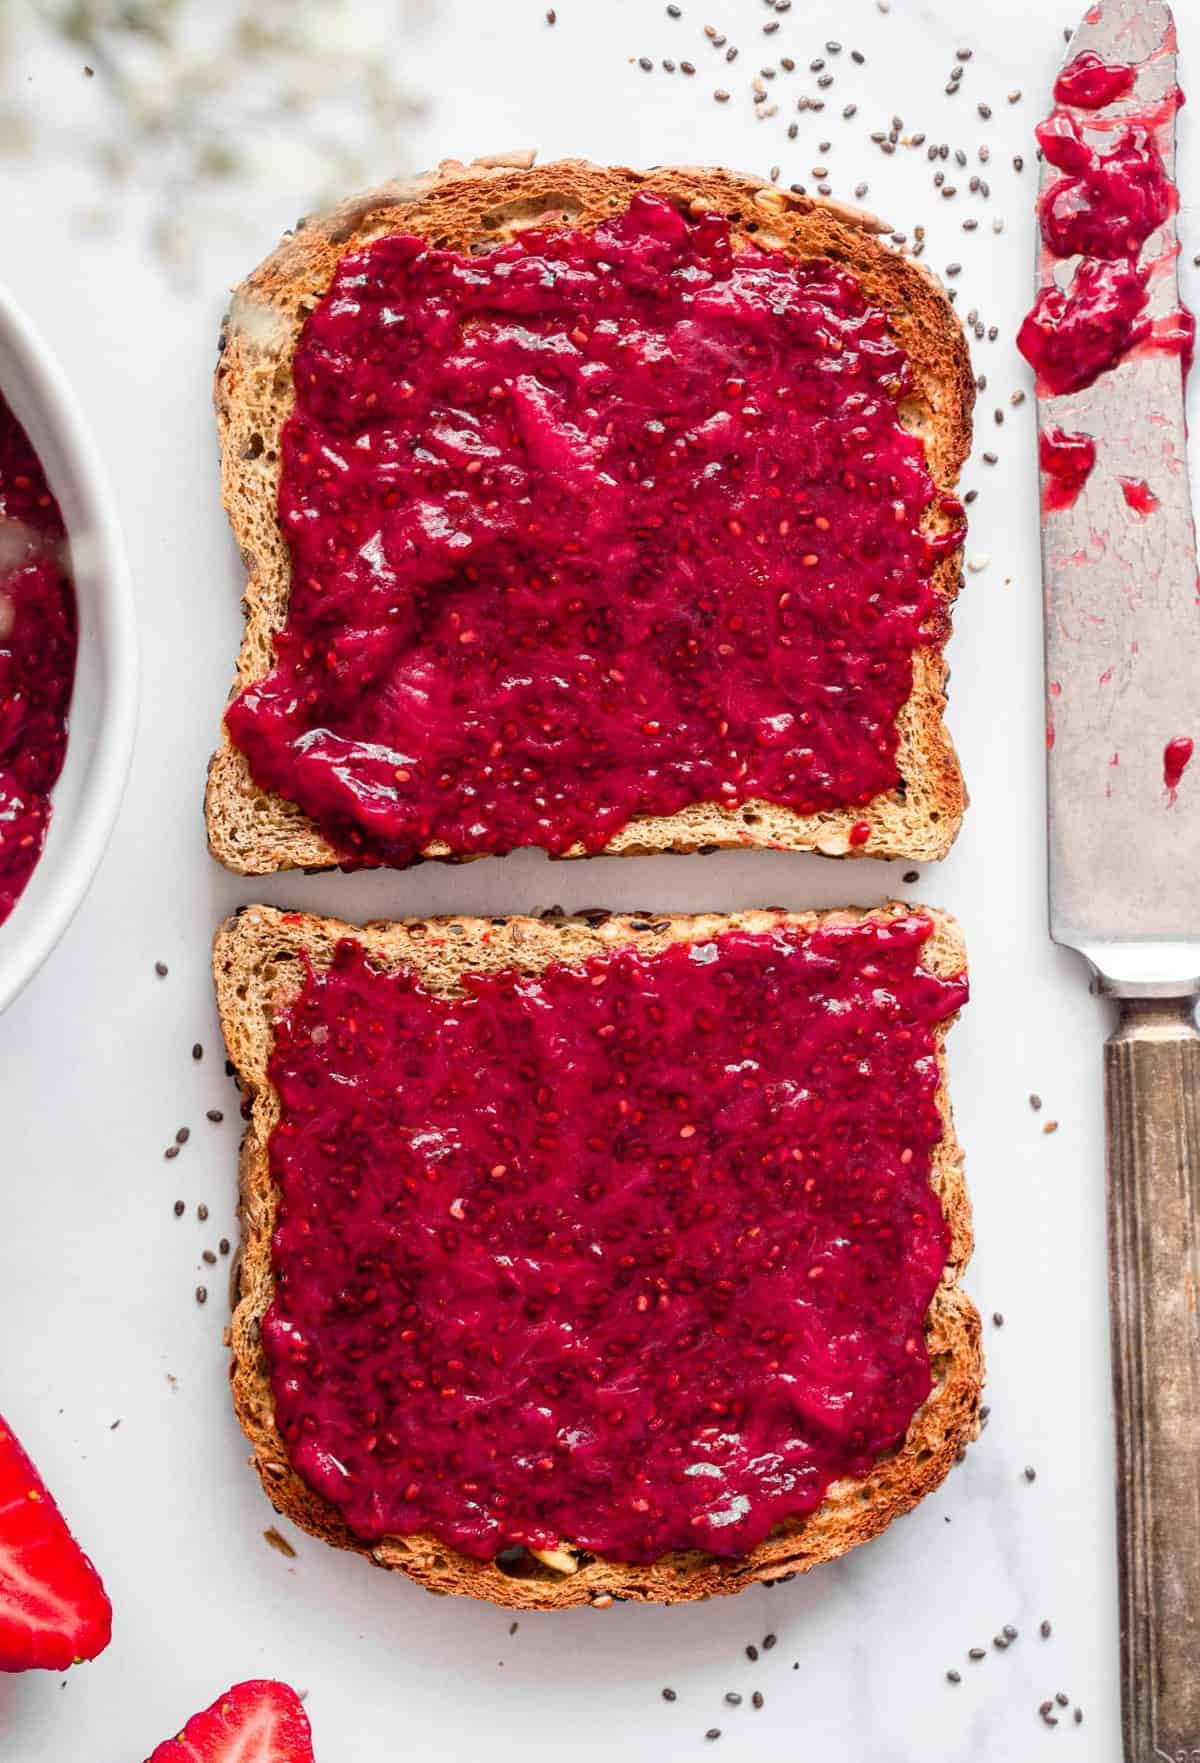 strawberry chia jam spread on 2 slices of toast